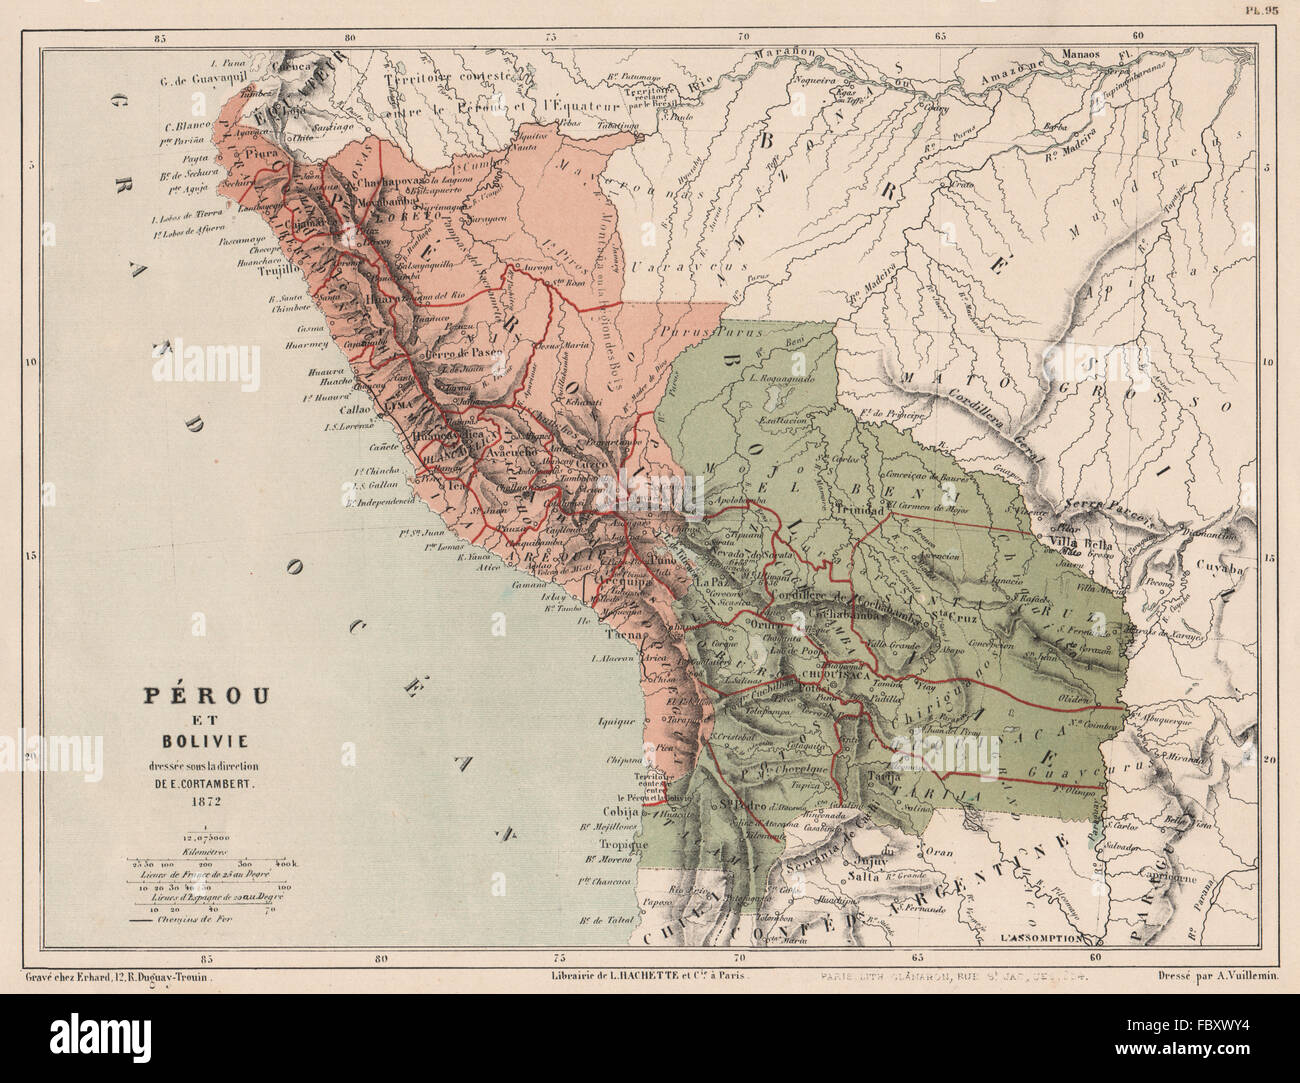 PERU & BOLIVIA with Littoral pre- War of the Pacific. Pérou et Bolivie, 1880 map - Stock Image